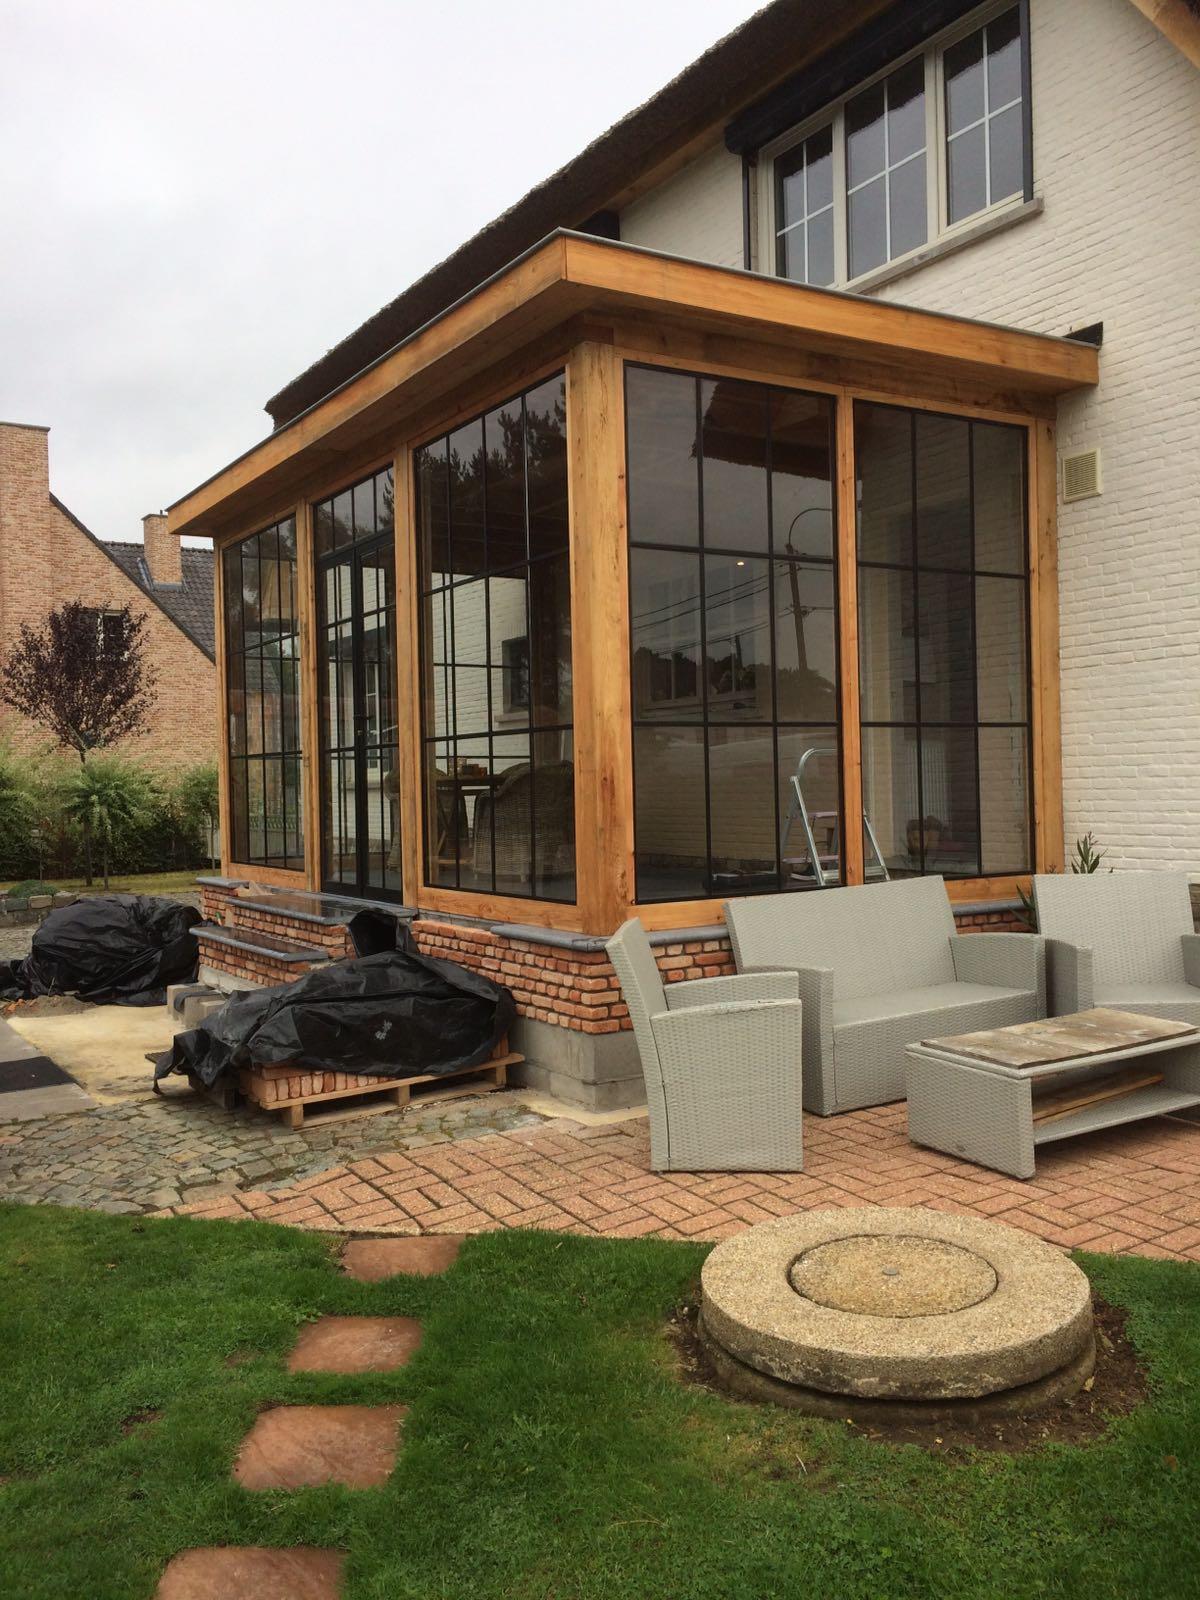 houten-tuinkamer-serre-2 - Project Belgiè gesloten tuinkamer-serre.